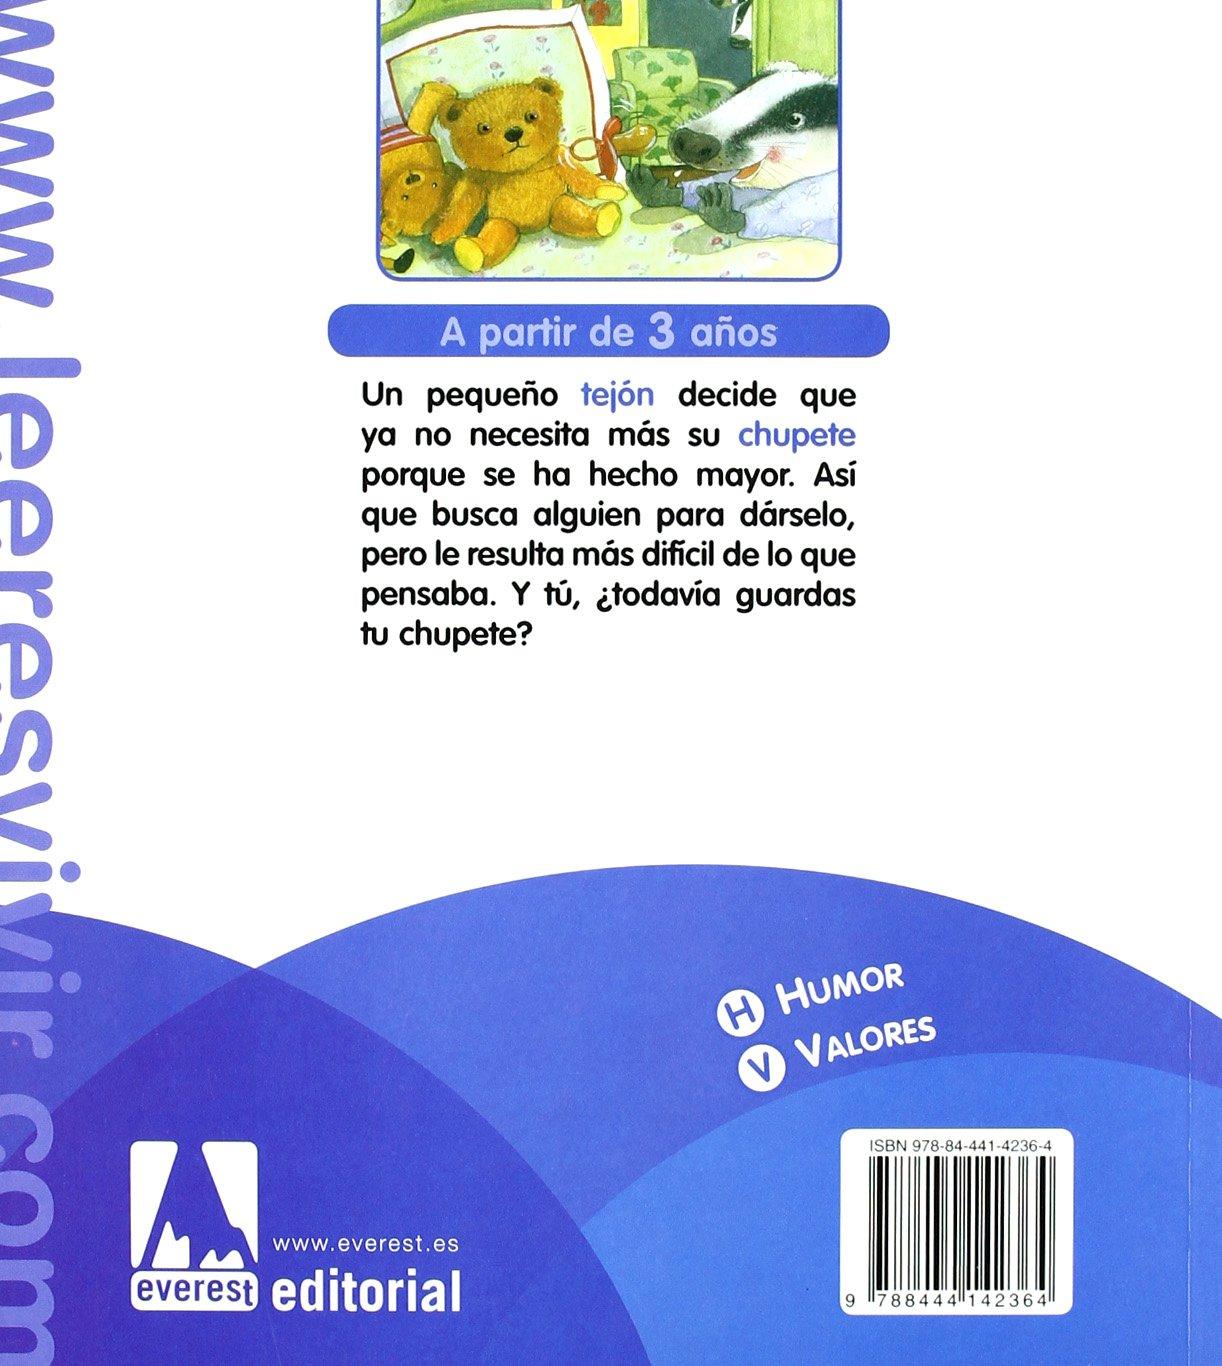 Adios querido chupete: Varios: 9788444142364: Amazon.com: Books